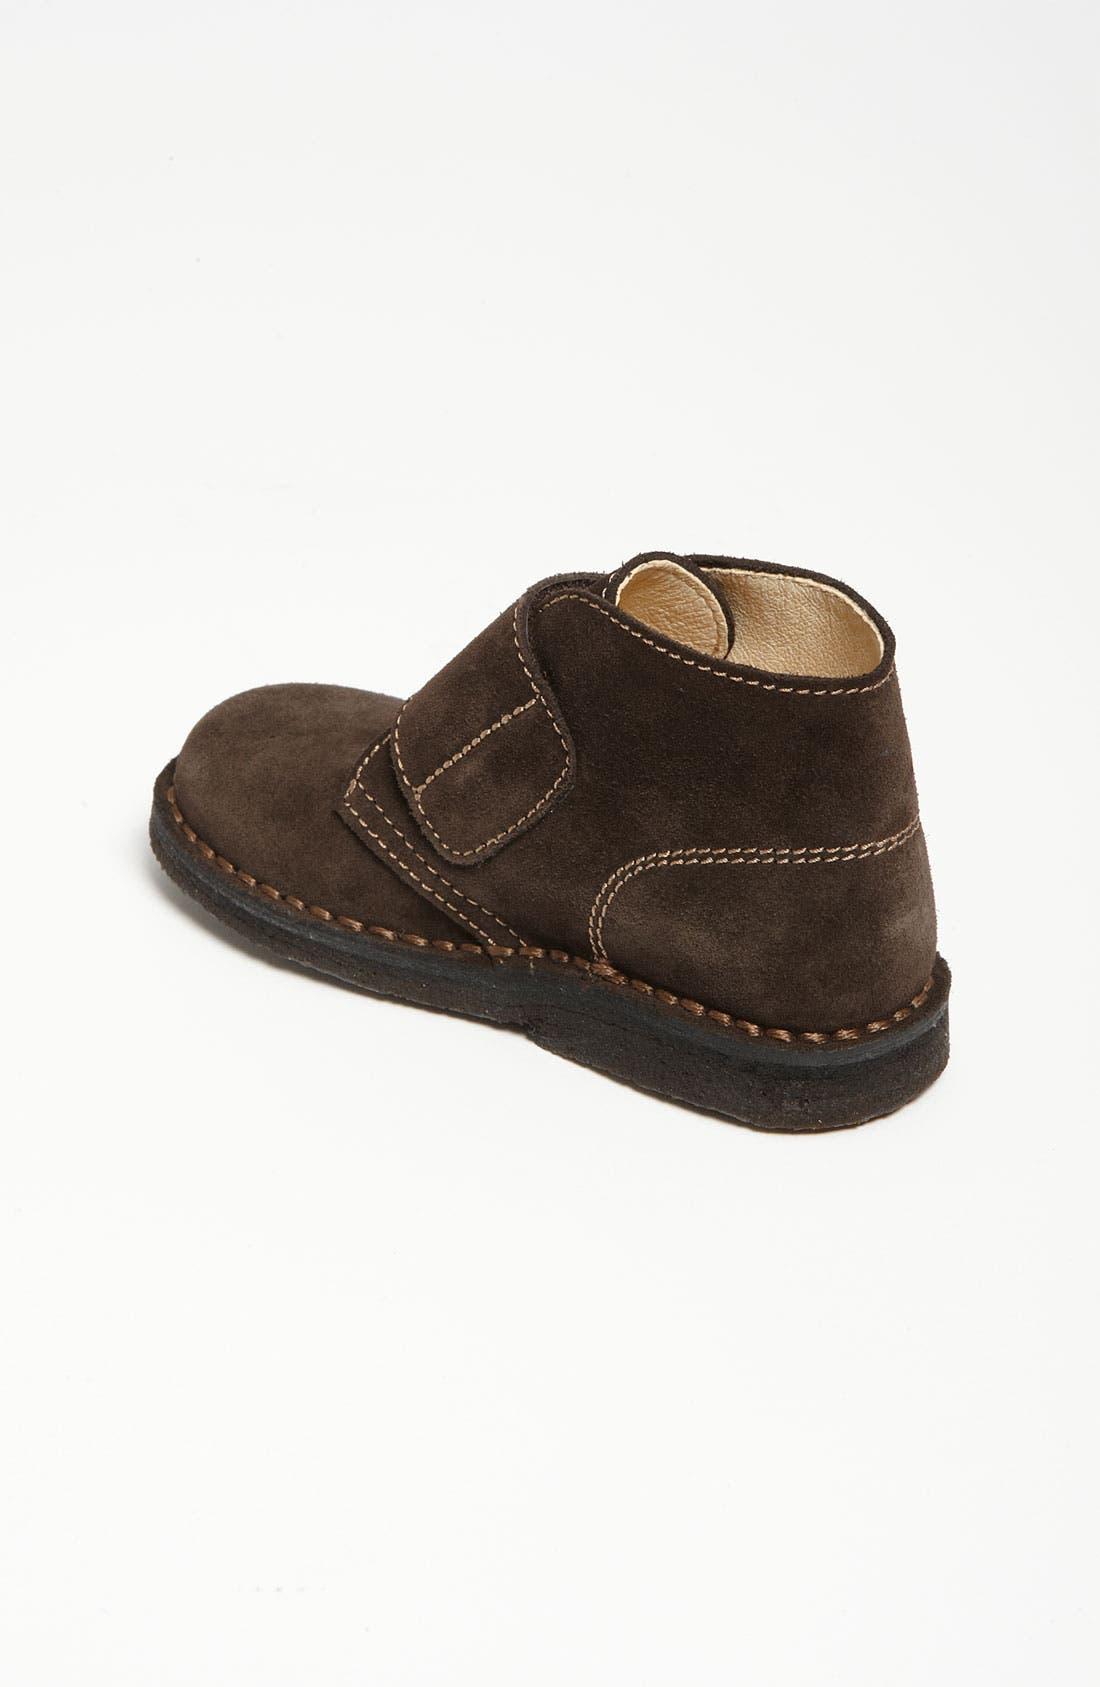 Alternate Image 2  - Primigi 'Groungy' Boot (Toddler)